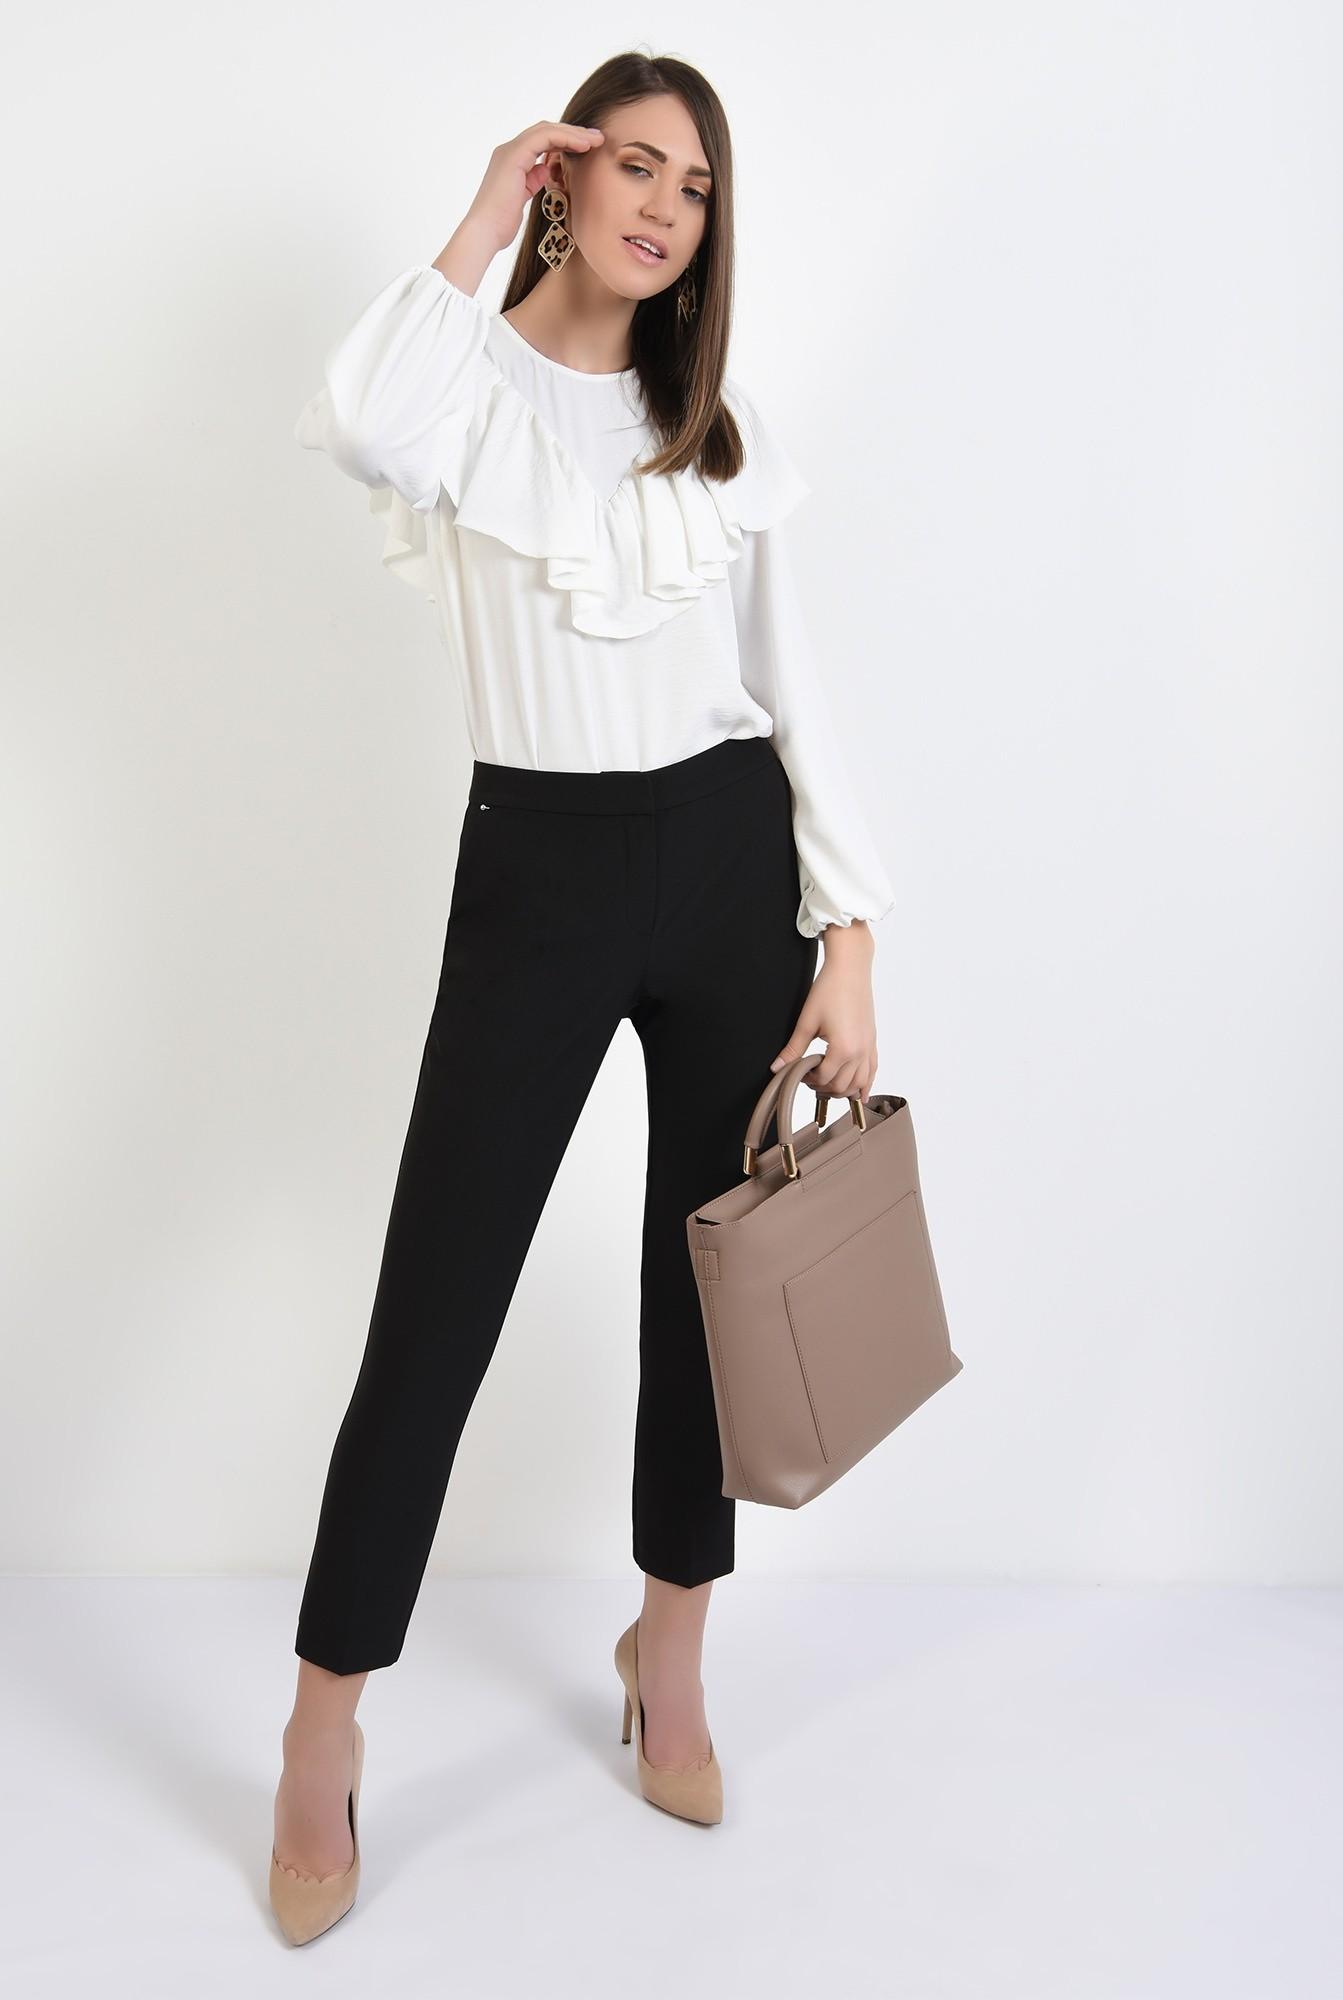 3 - bluza casual, cu platca, volan, maneci bufante, alb, bluza de primavara